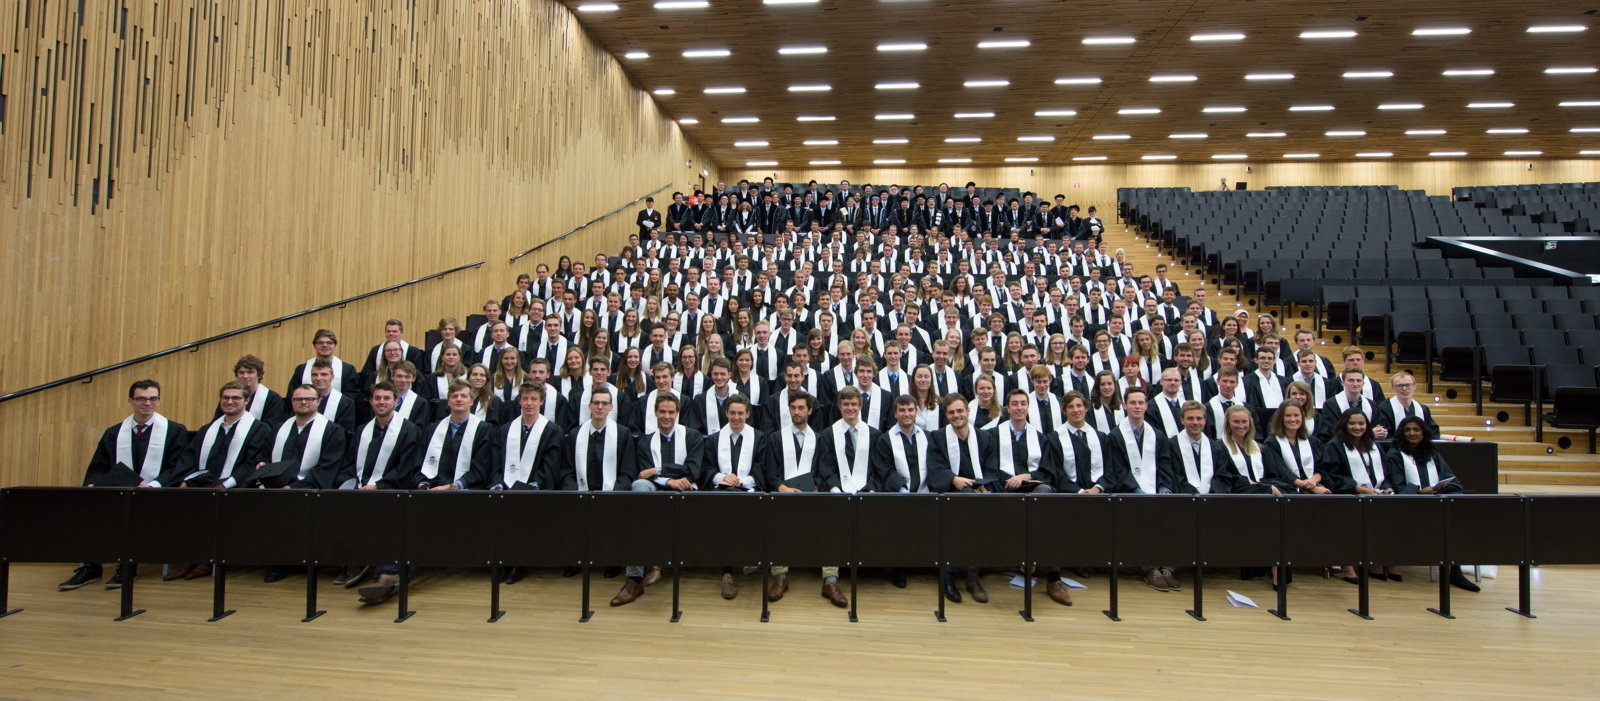 15-16 graduation ceremony